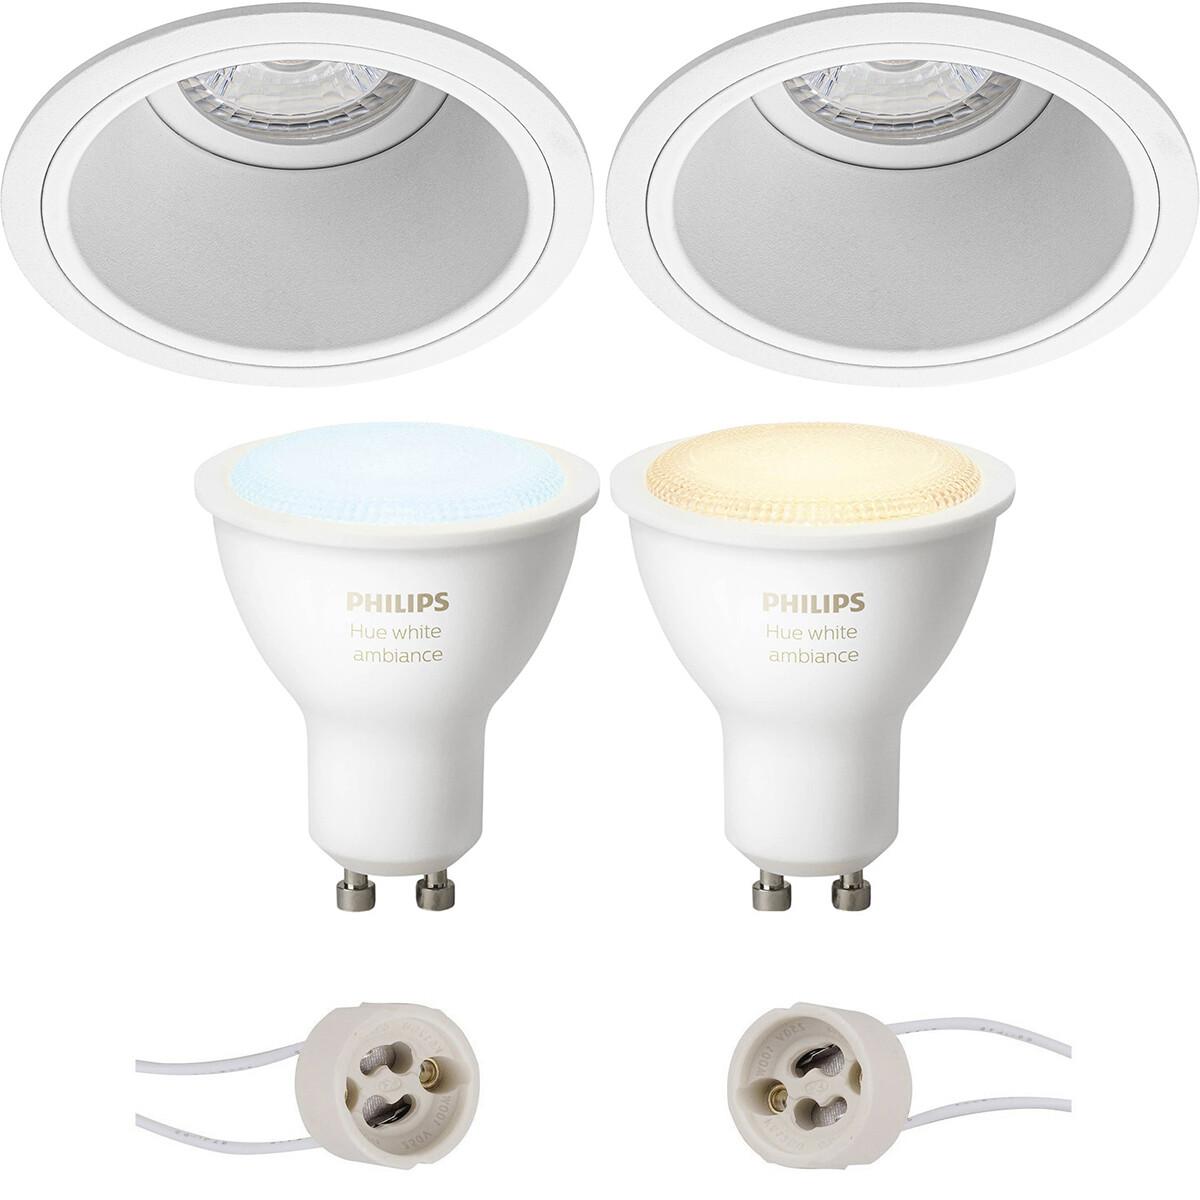 Pragmi Minko Pro - Inbouw Rond - Mat Wit - Verdiept - Ø90mm - Philips Hue - LED Spot Set GU10 - Whit